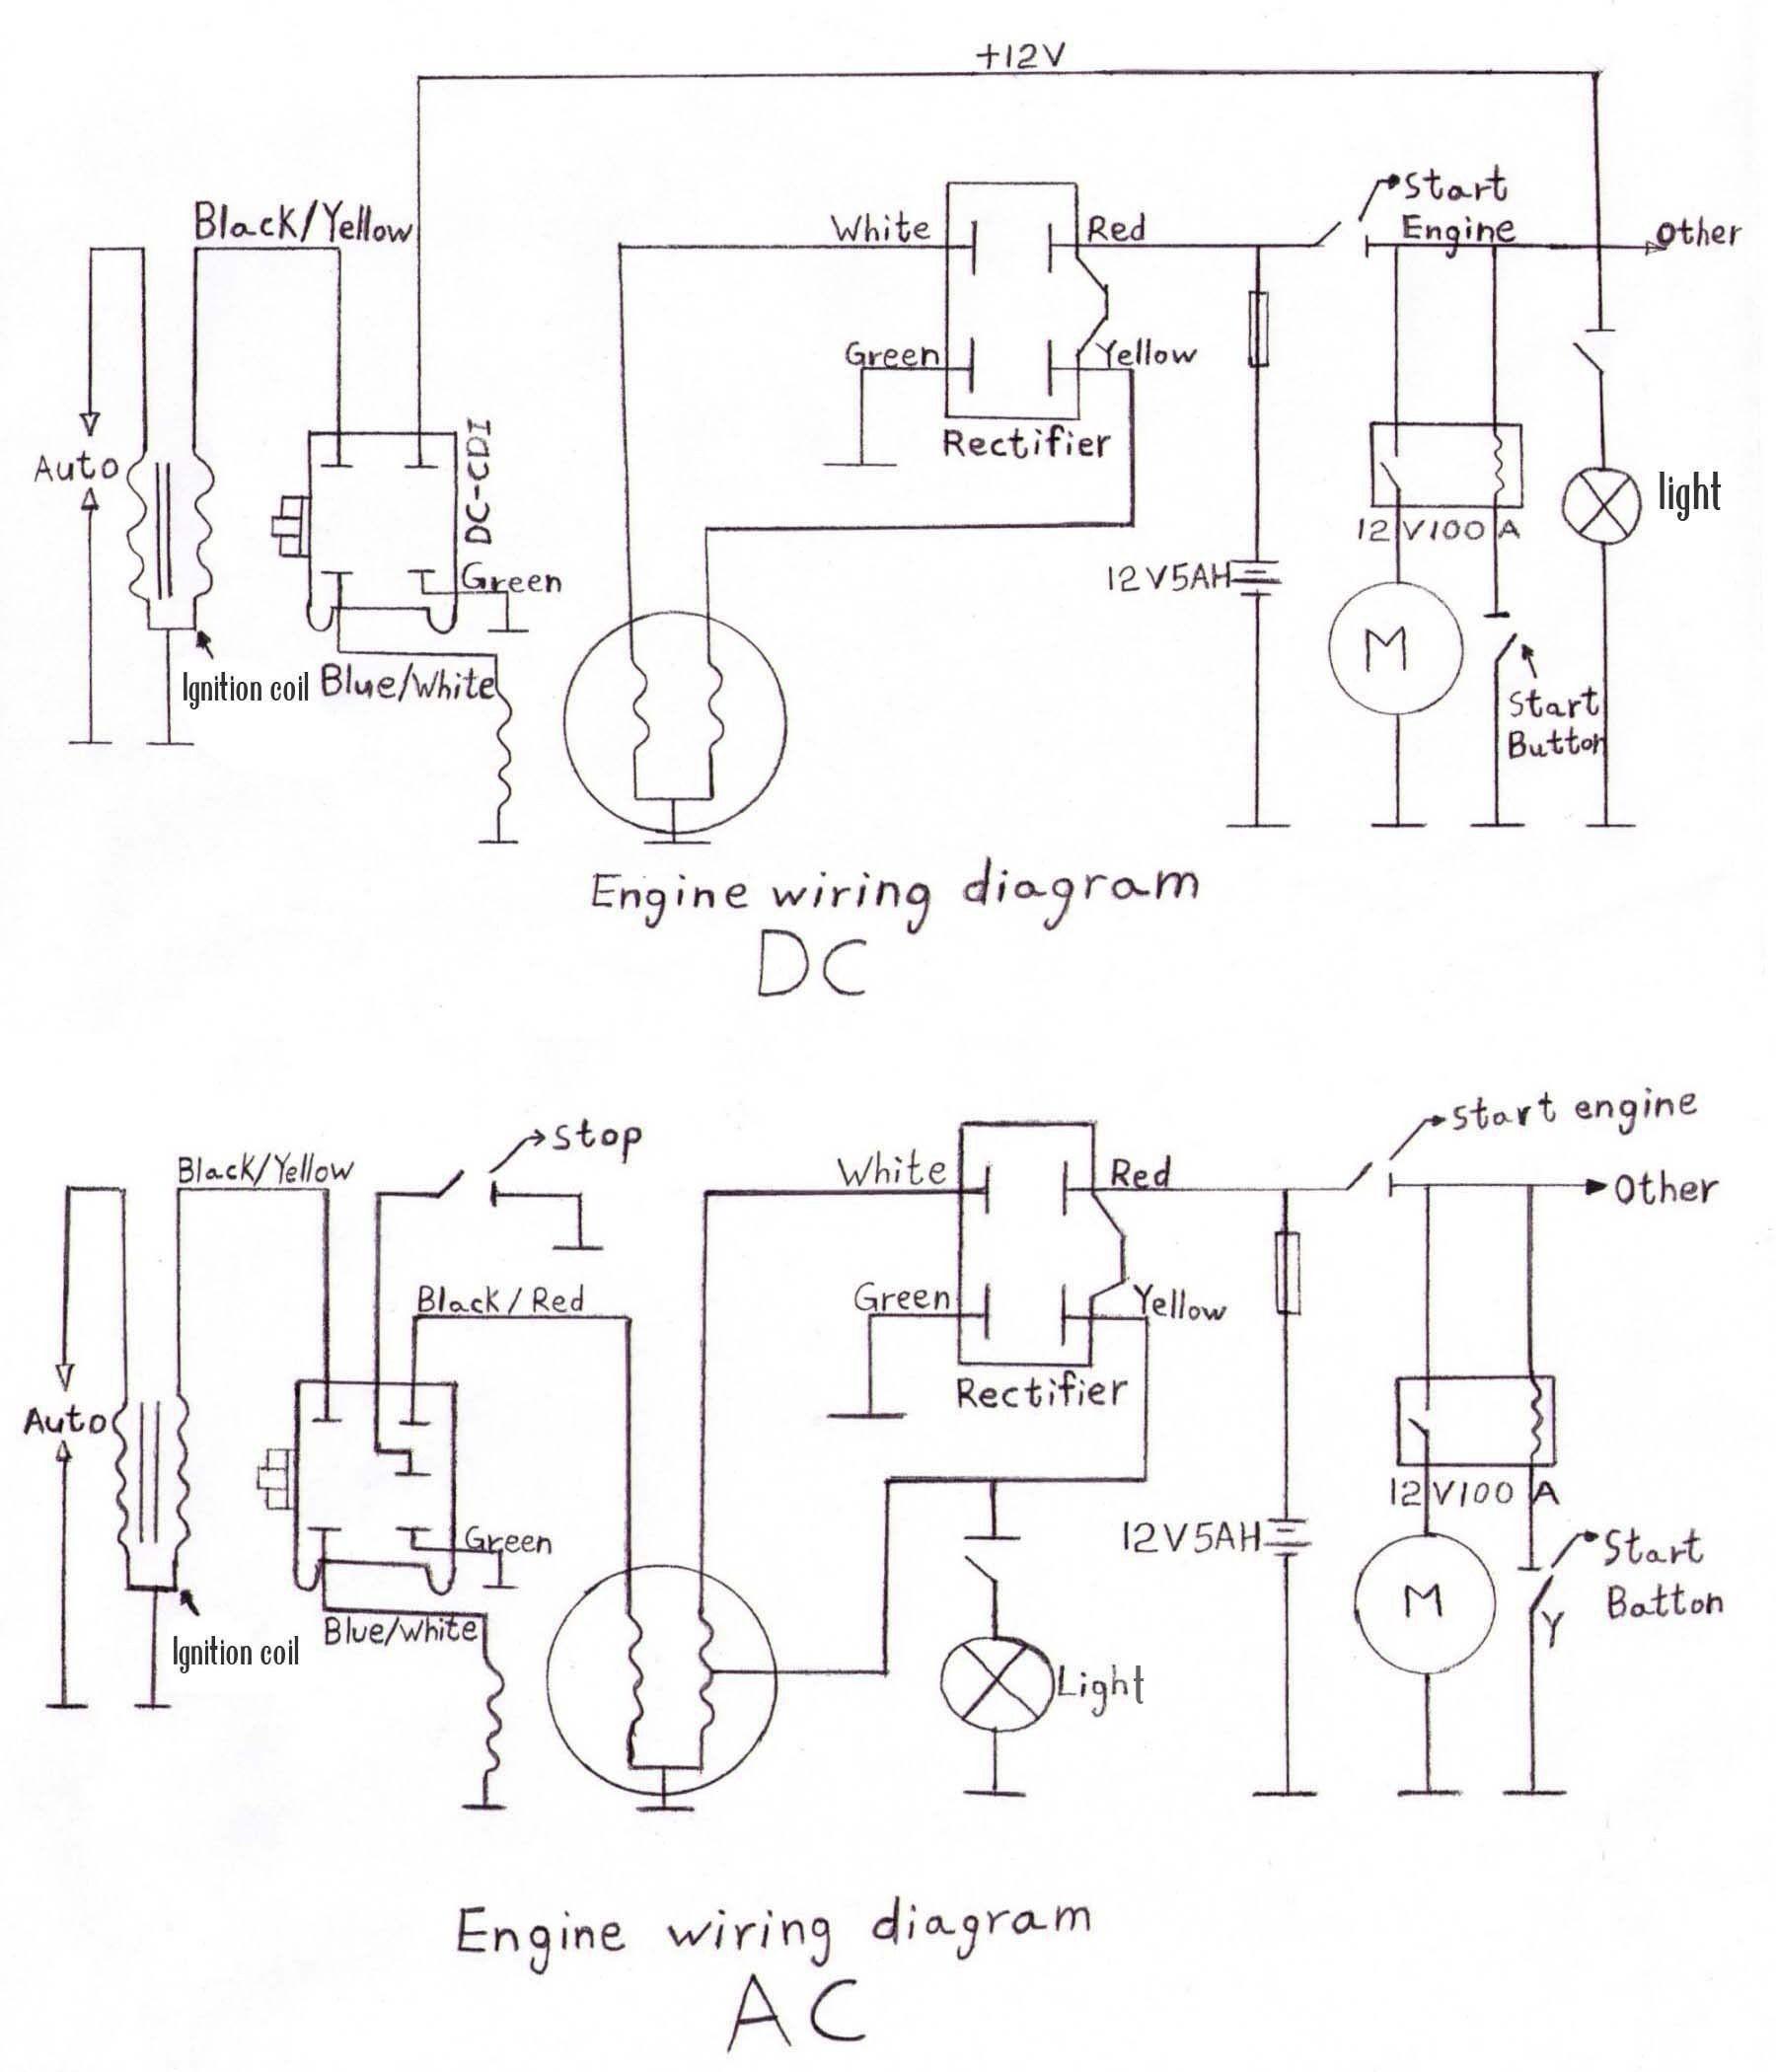 Lifan 125cc Engine Diagram - Wiring Diagram Sourcesavemoney.gg